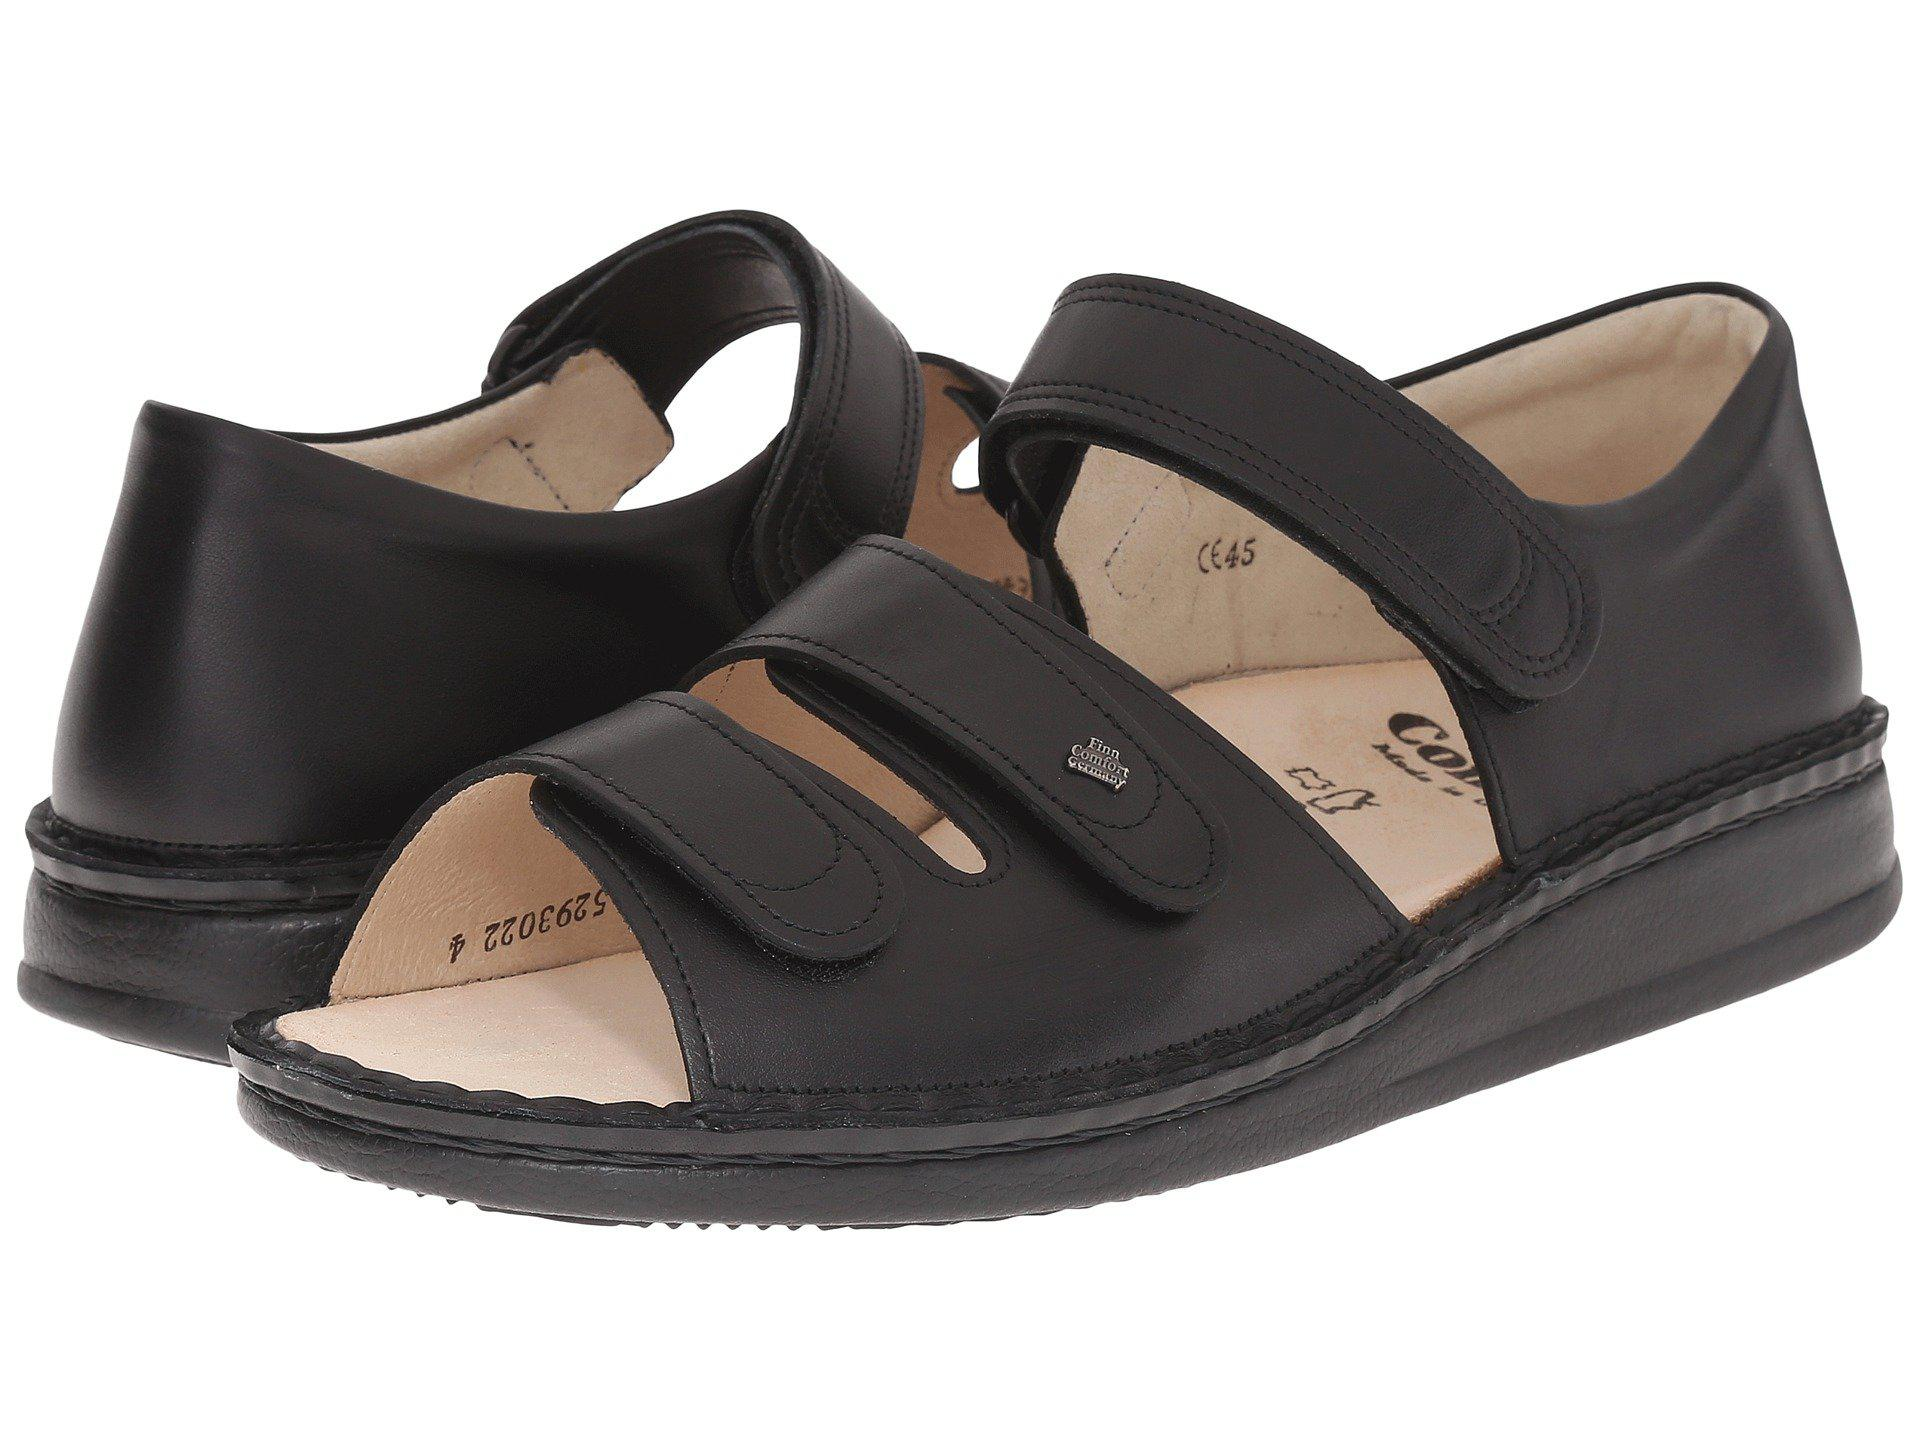 169d8dd032b7 Lyst - Finn Comfort Baltrum (nut) Shoes in Black